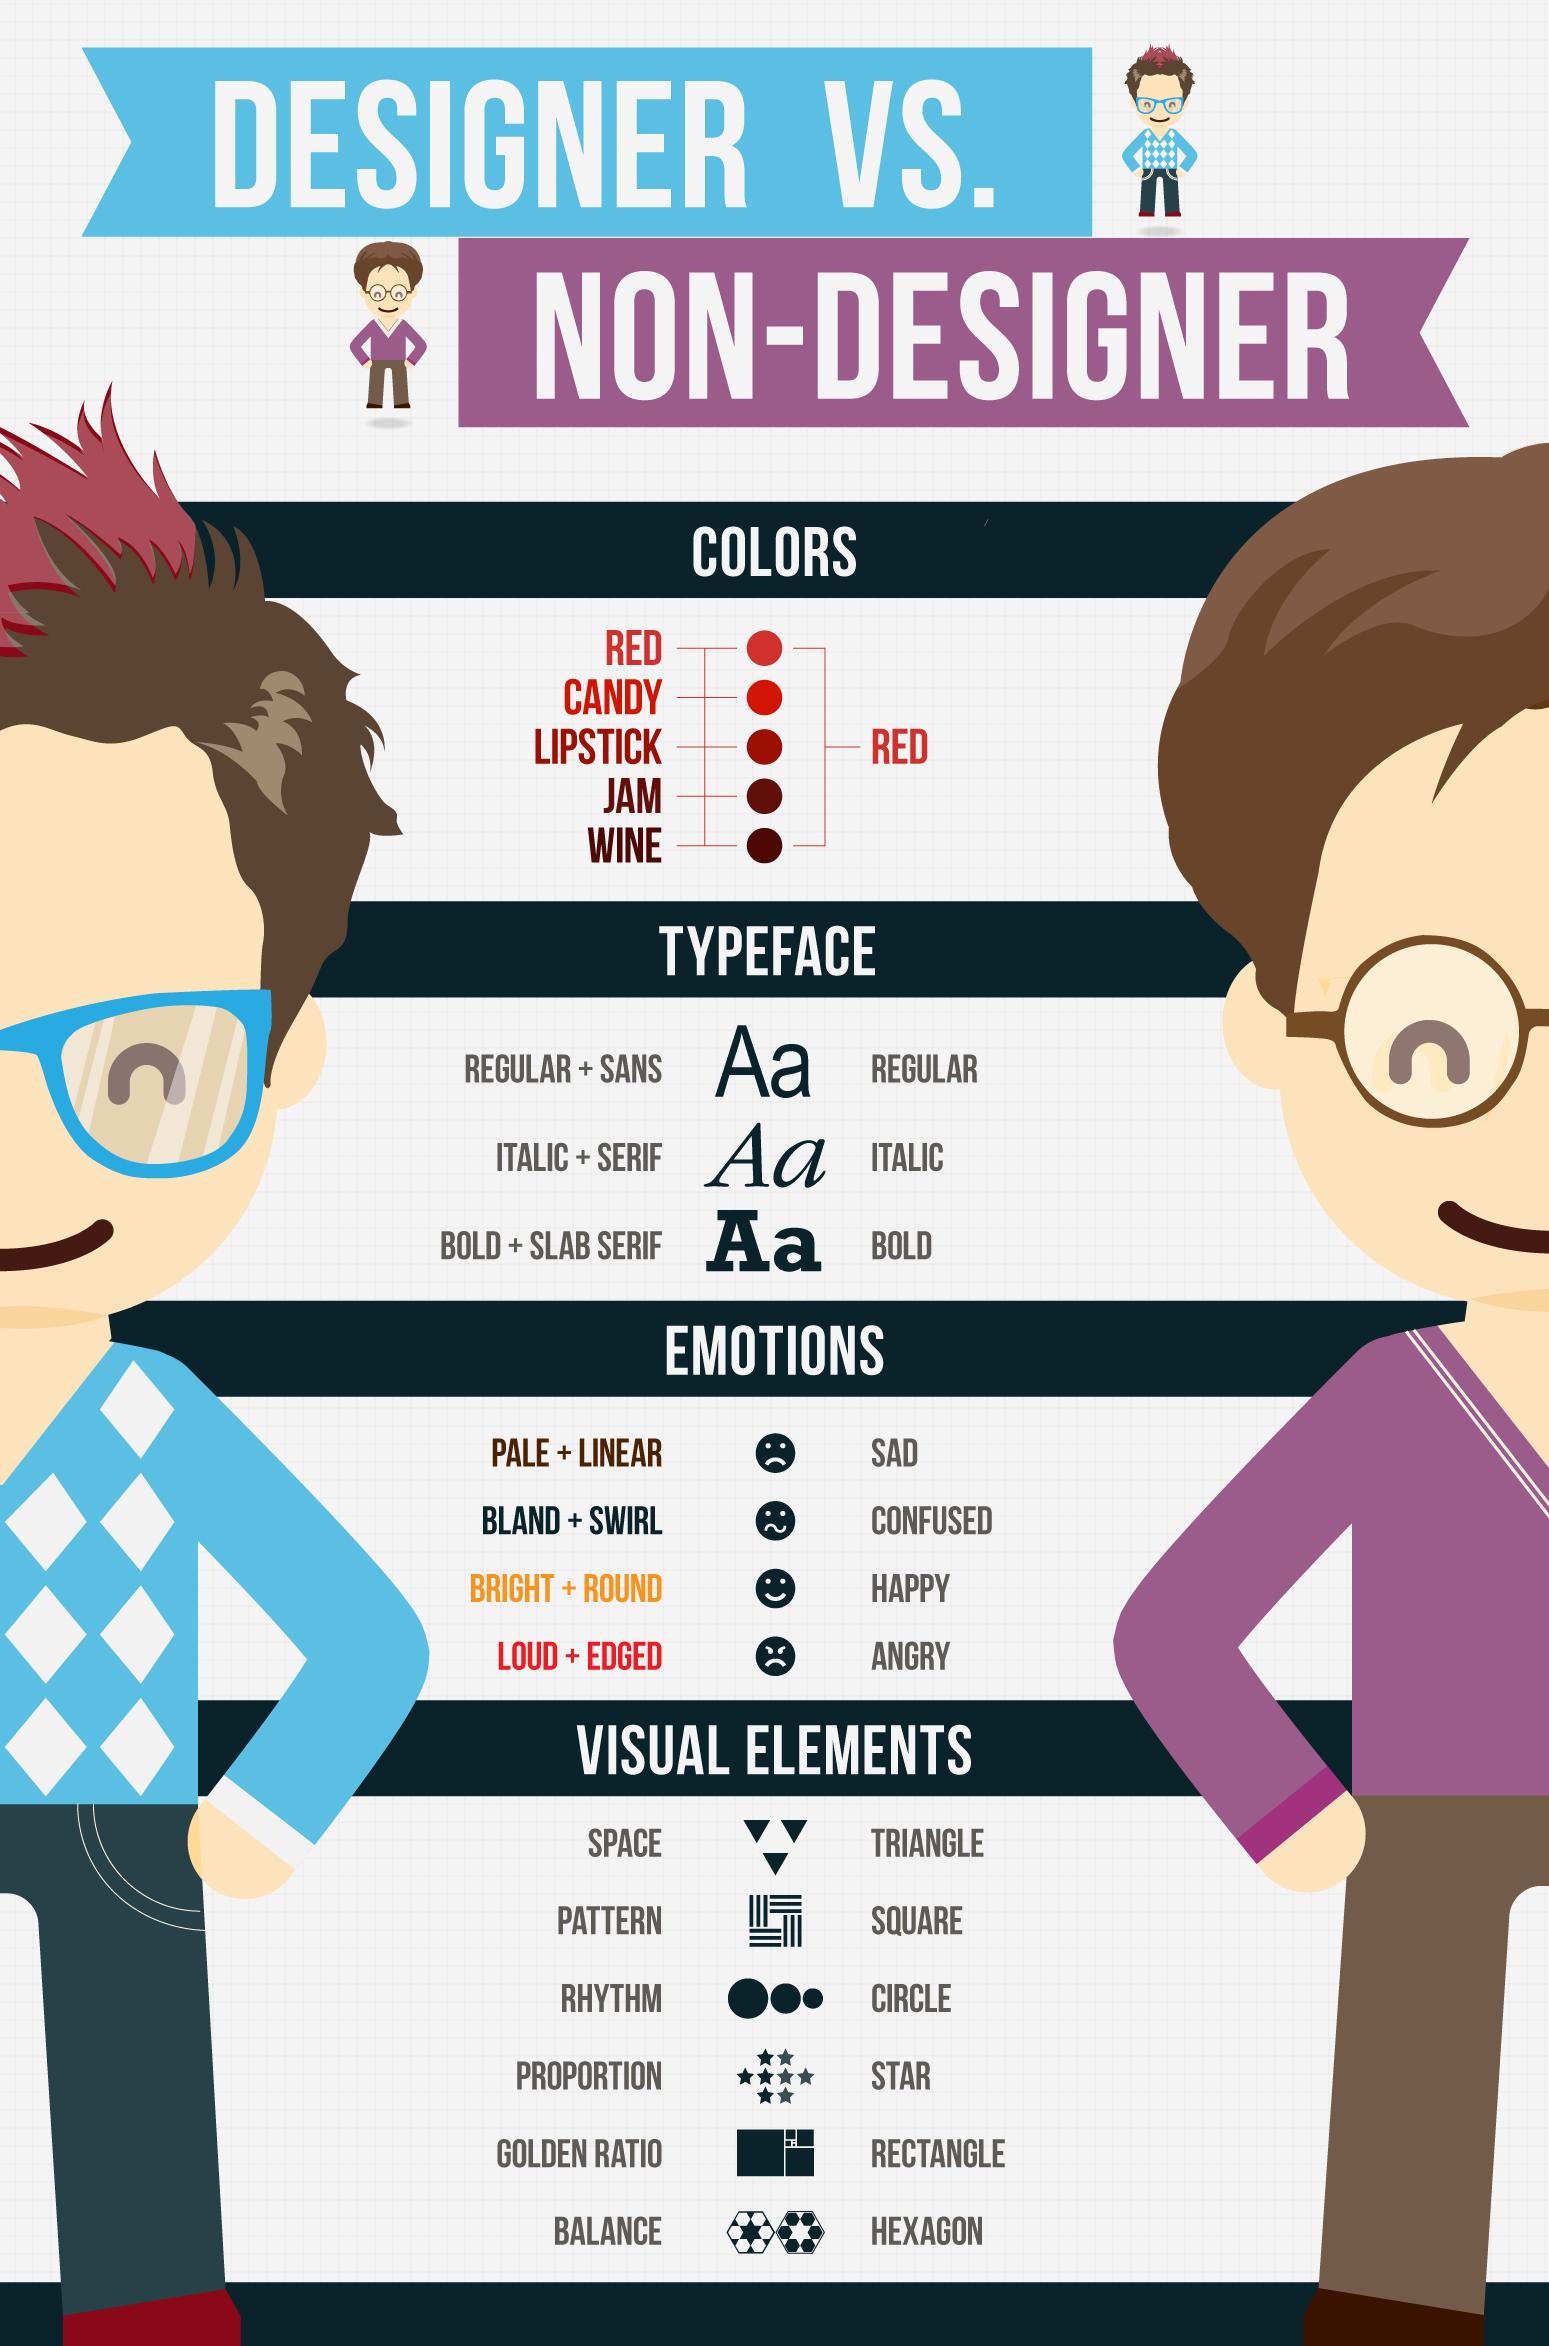 Designer vs. Non-Designer